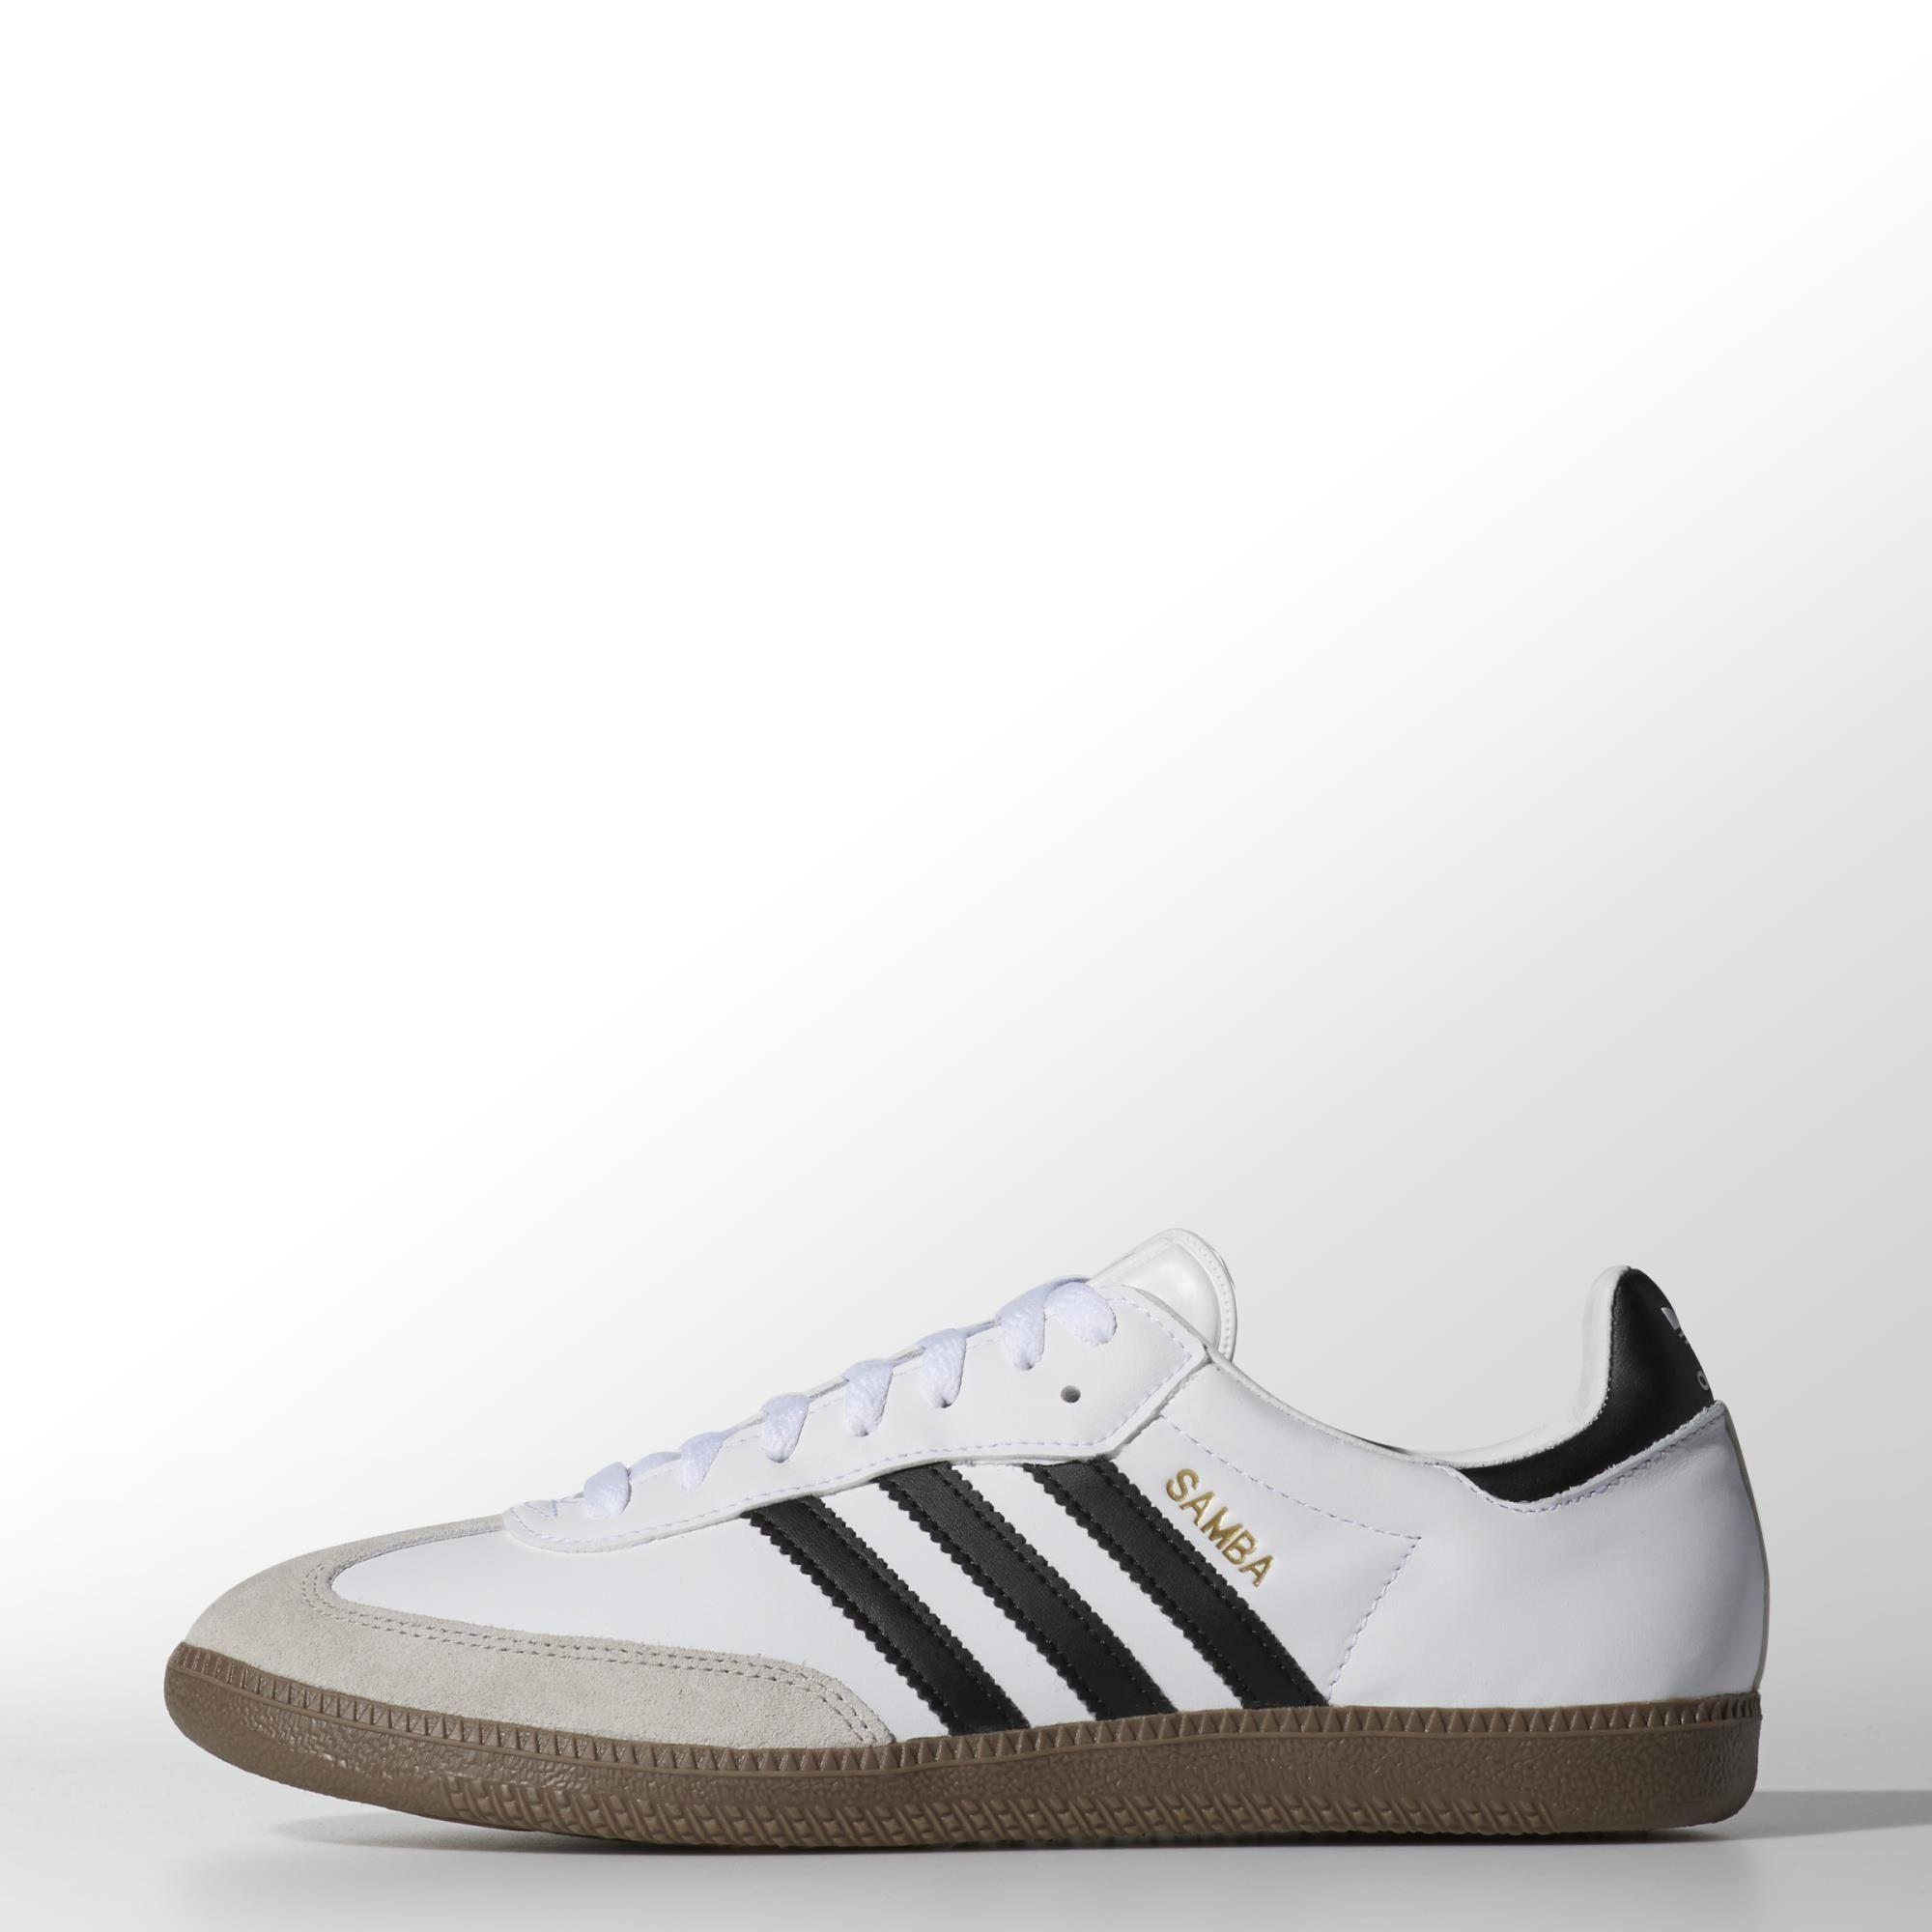 adidas Men's Samba Shoes White | adidas Canada | Samba